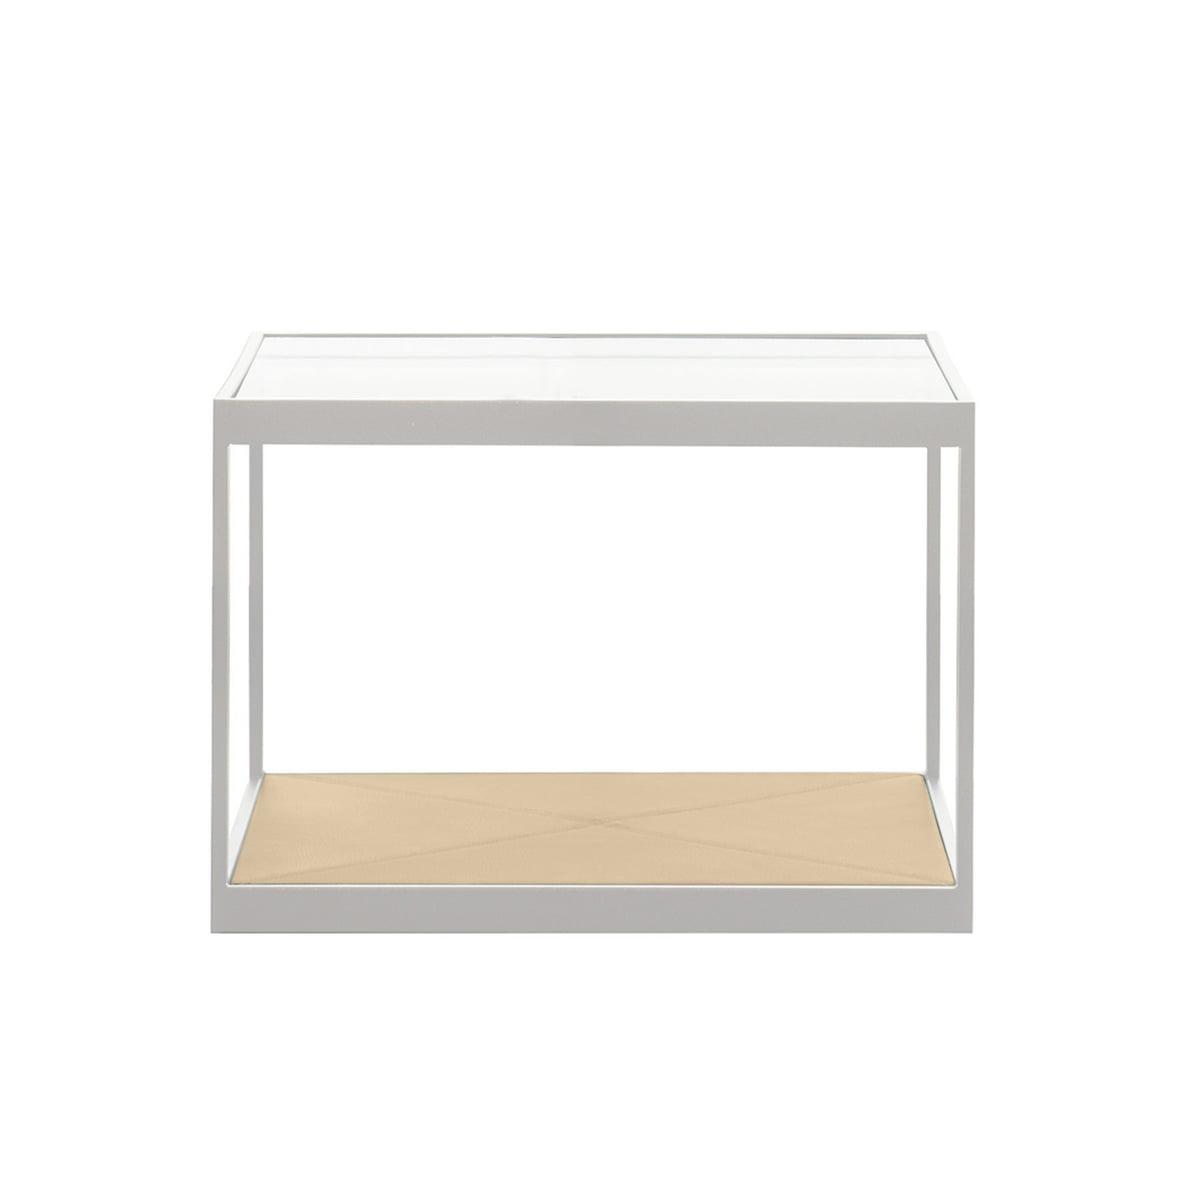 Röshults   Monaco Coffee Table 50 X 50cm, White / Leather Sand